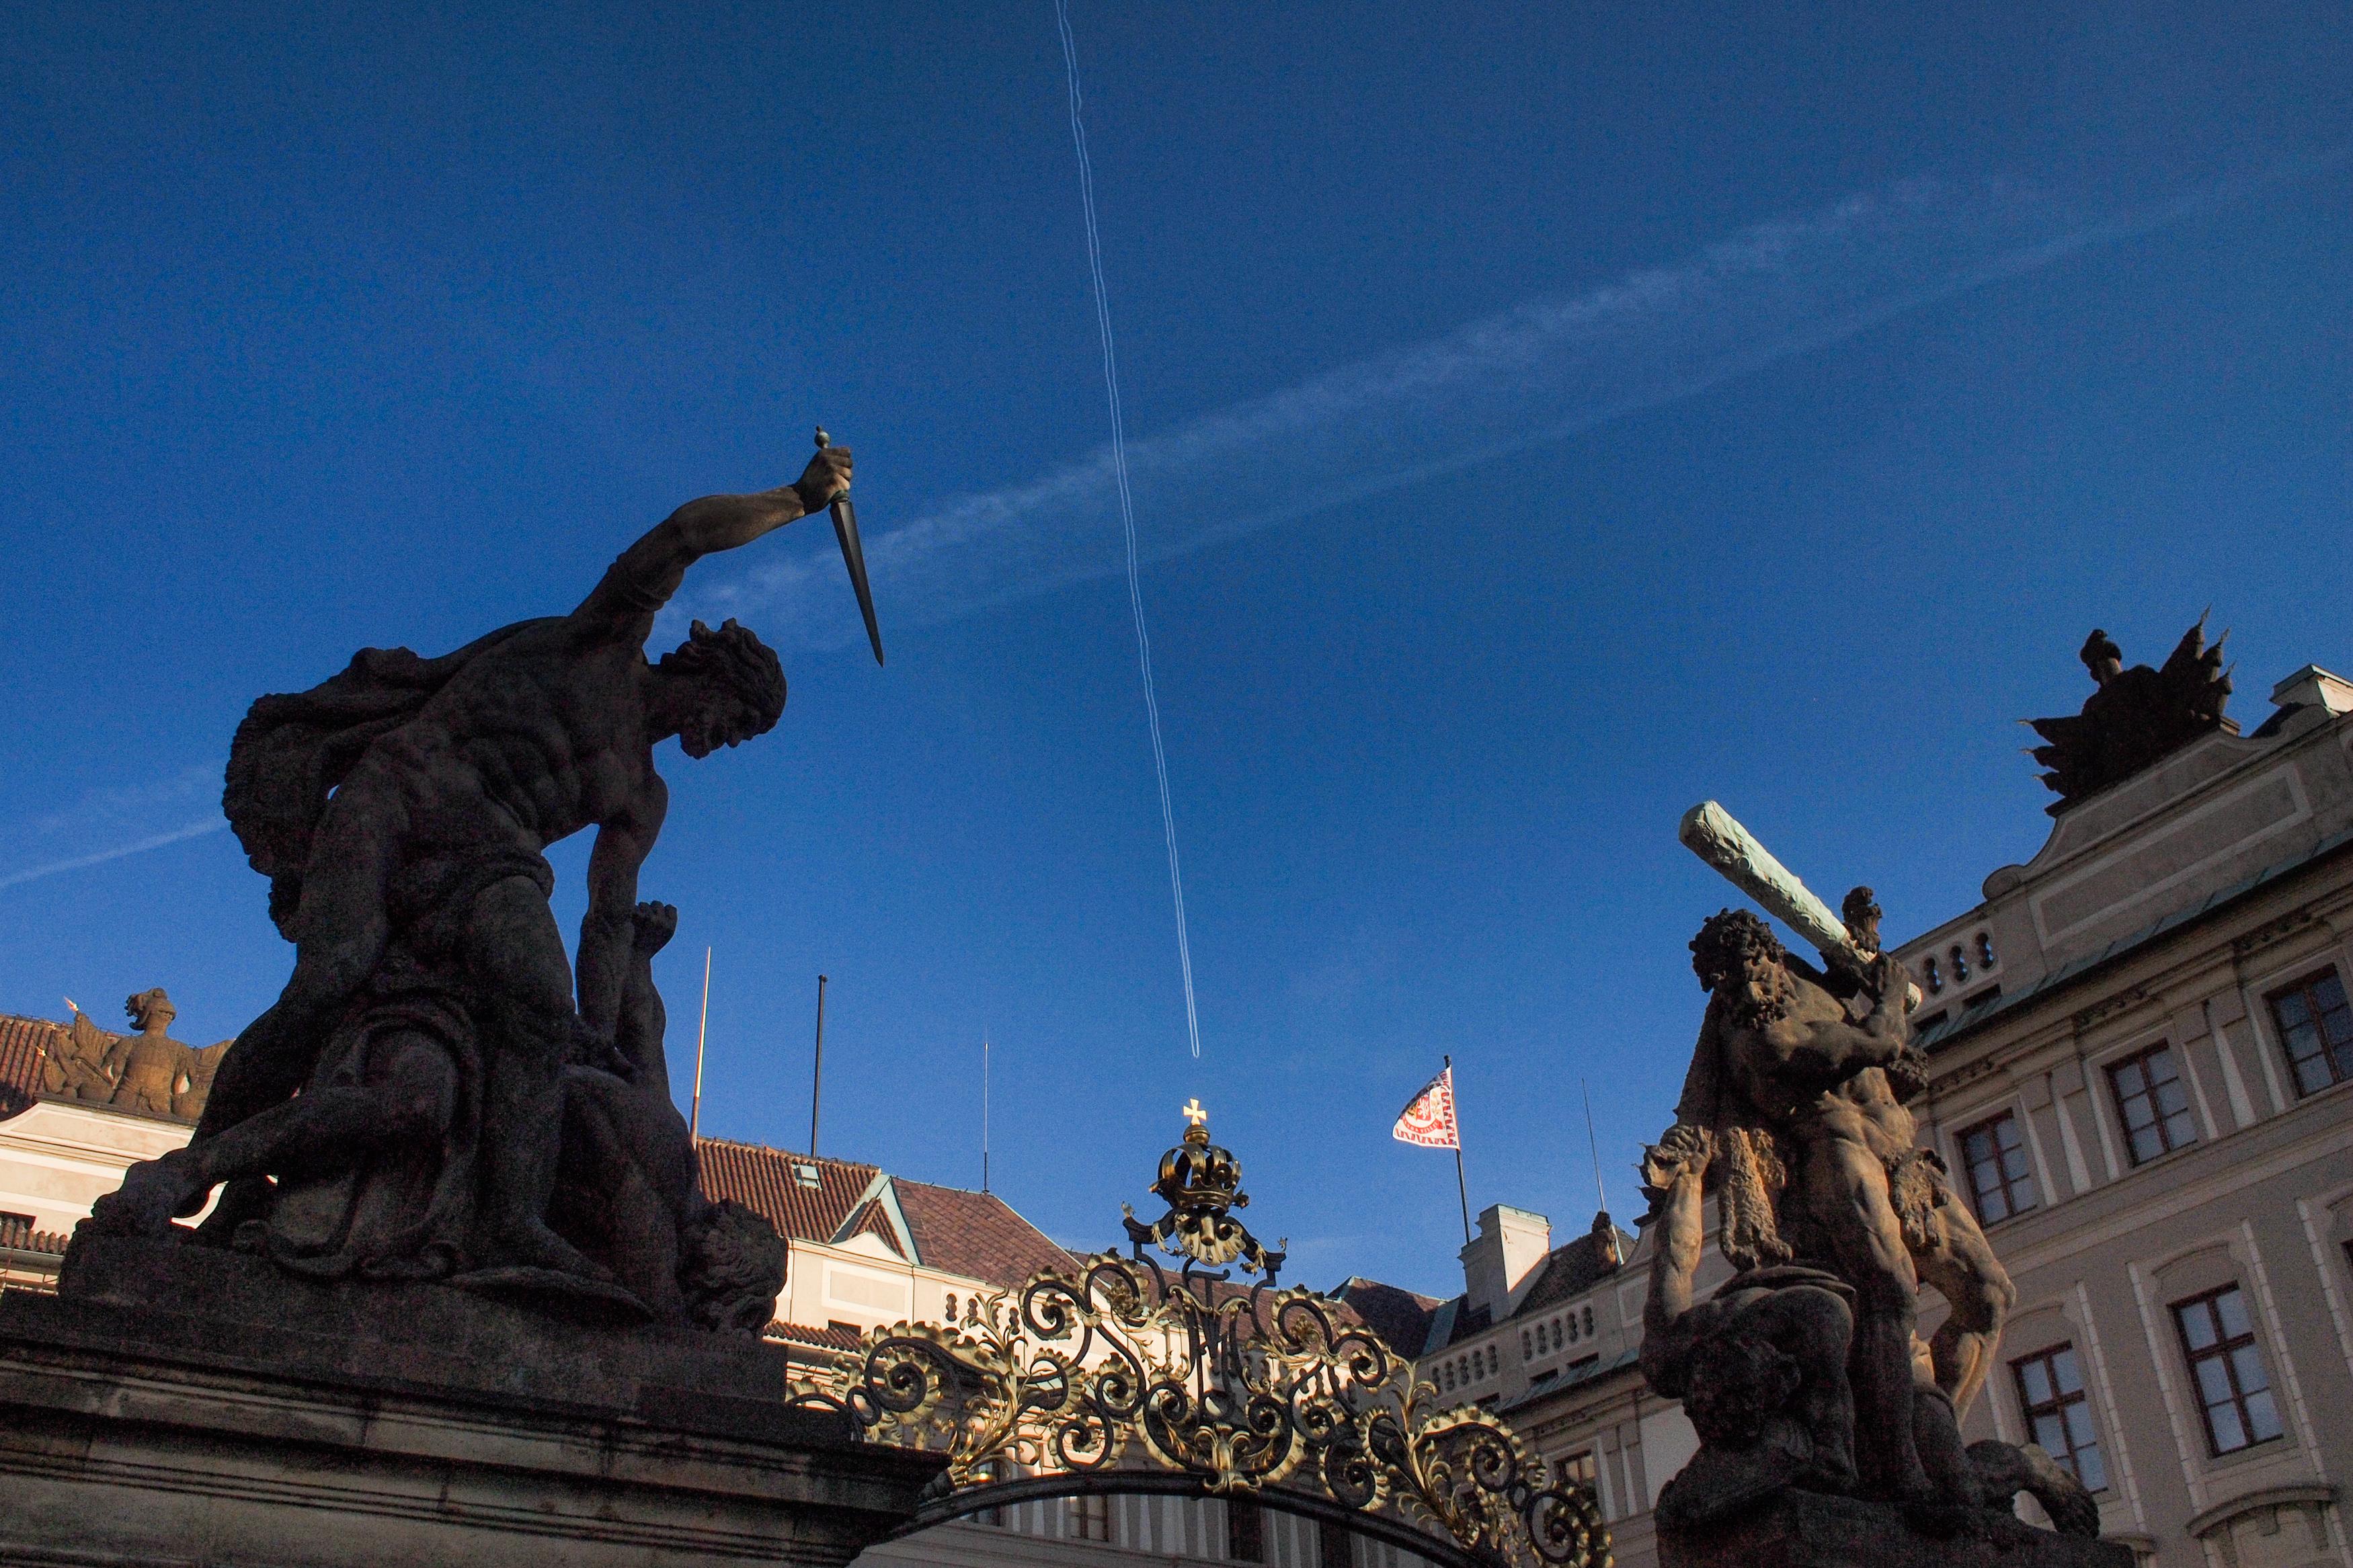 88a3dc5e7 File:Fighting Giants statues On Prague Castle Gate. Prague, Czech Republic, Western  Europe. January 1, 2014.jpg